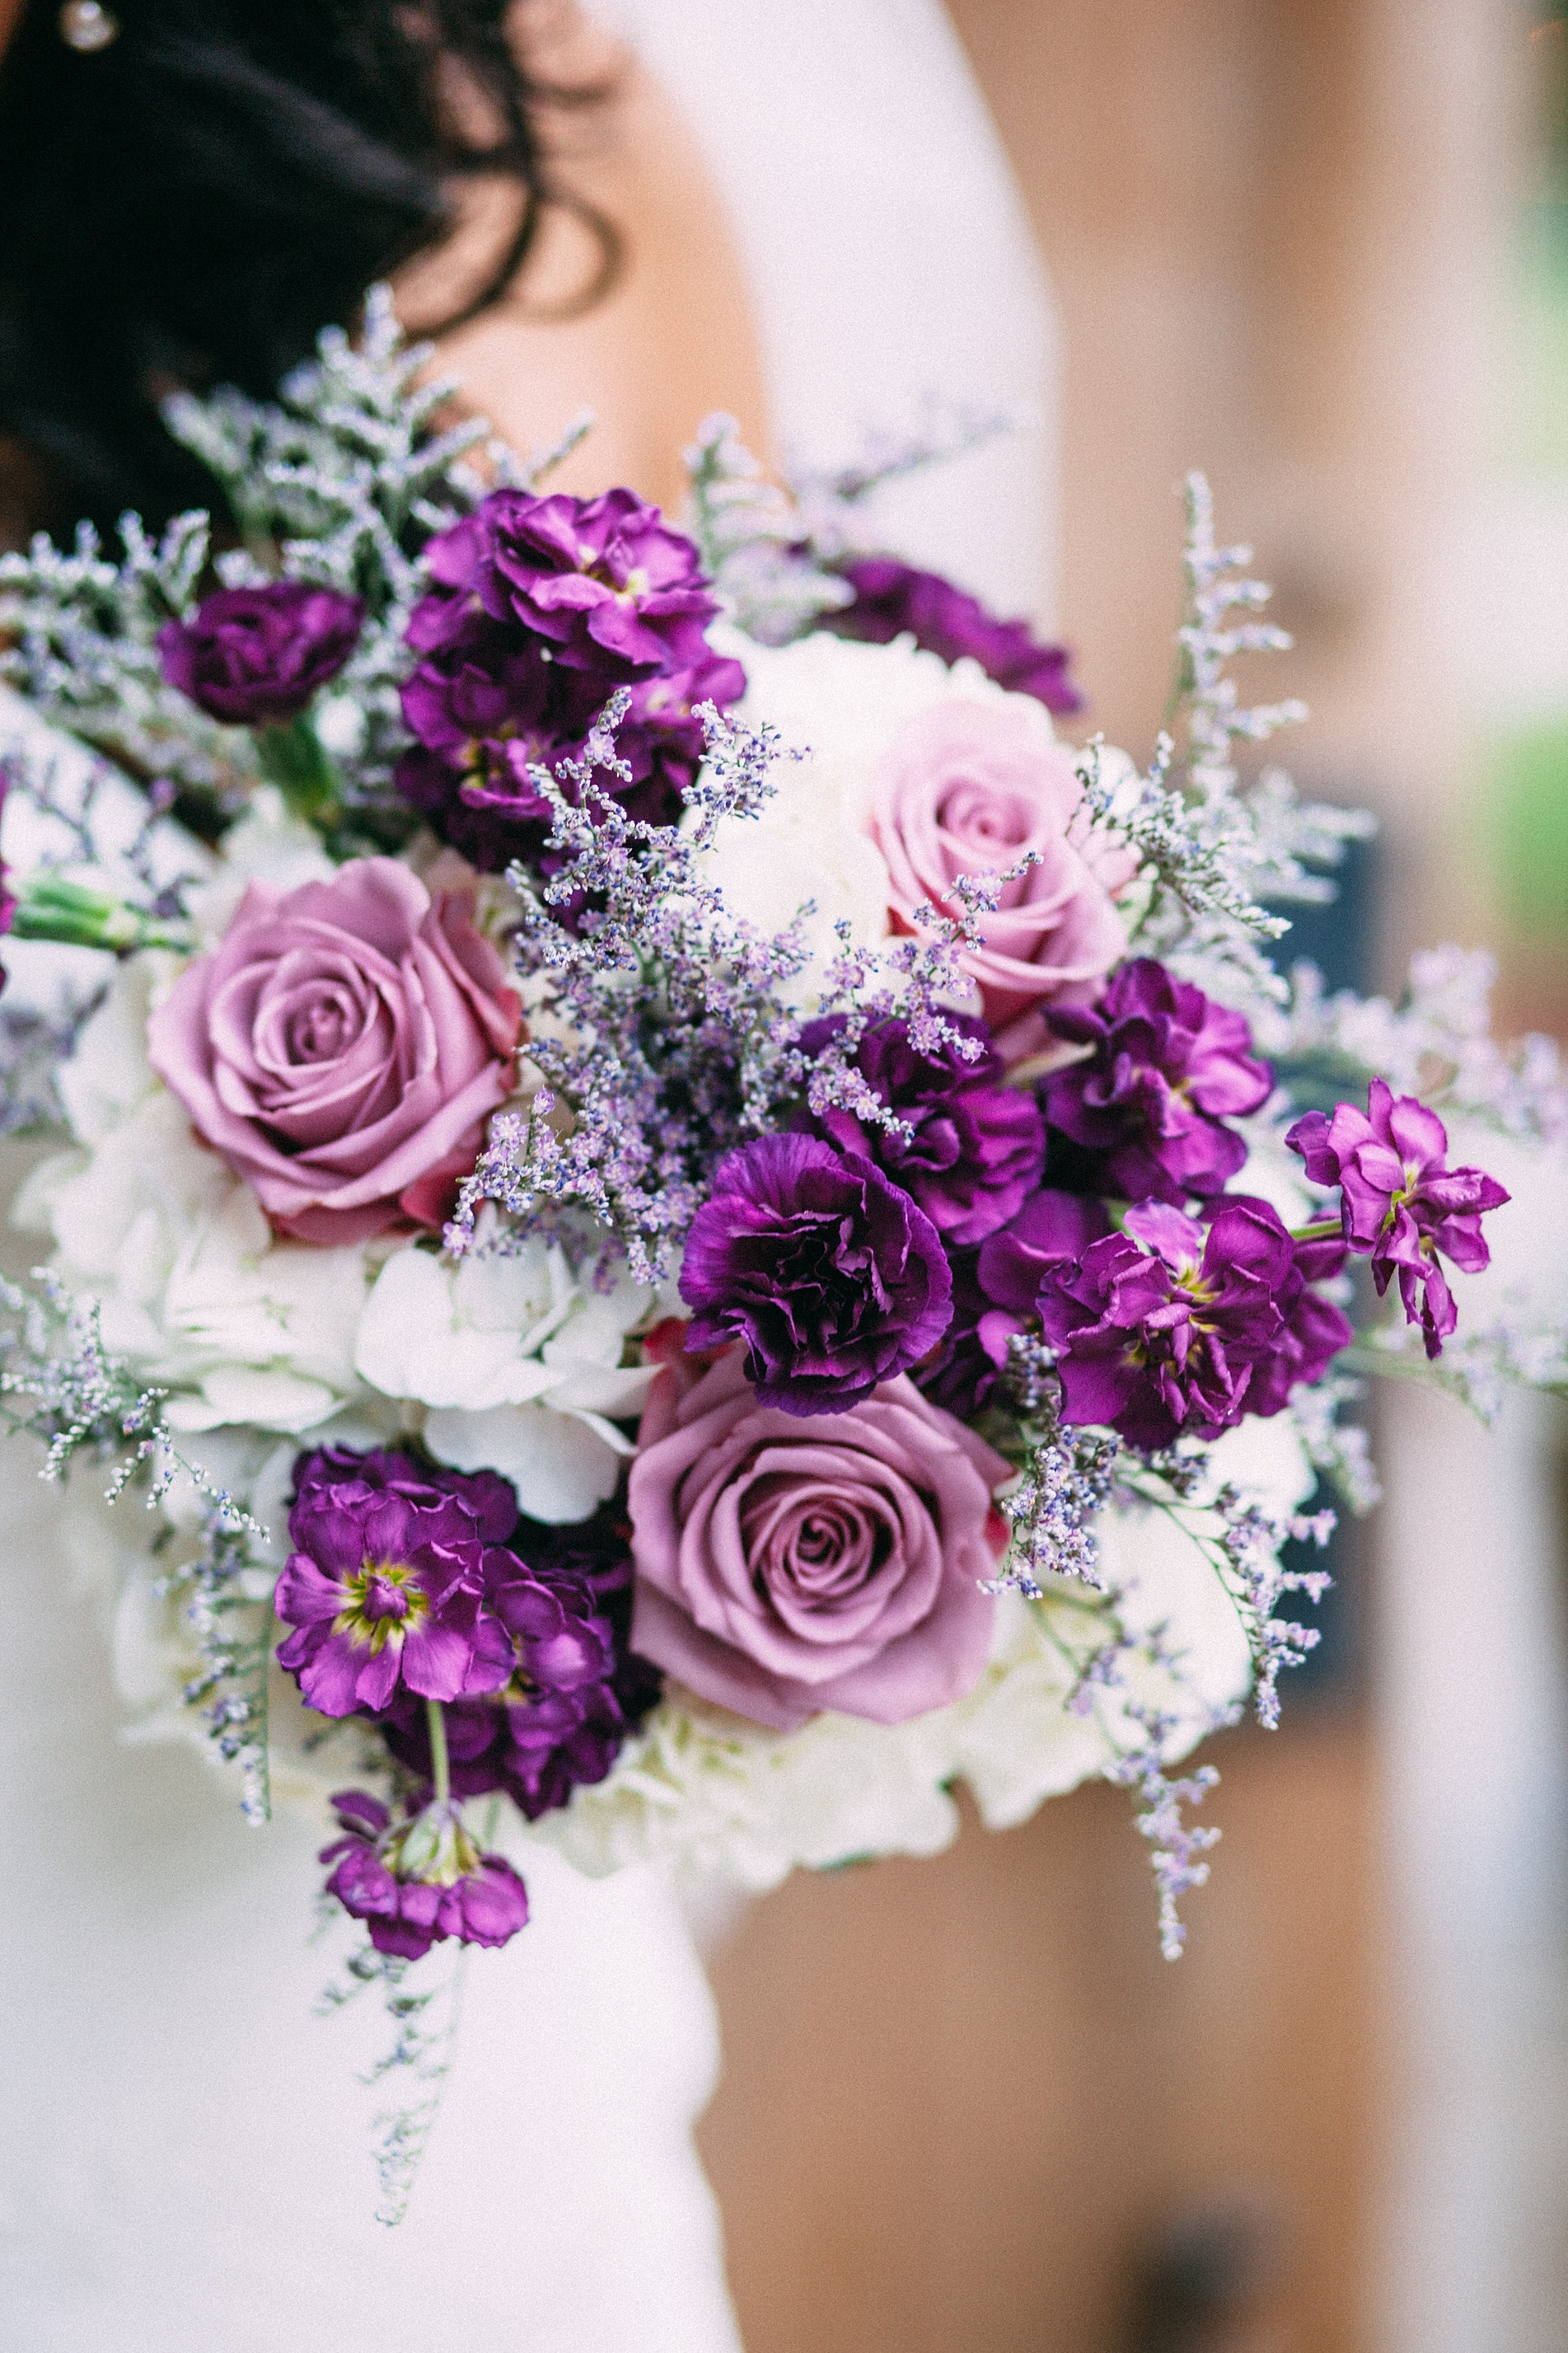 Oniees Engagements Wedding Planner In Greensboro Nc